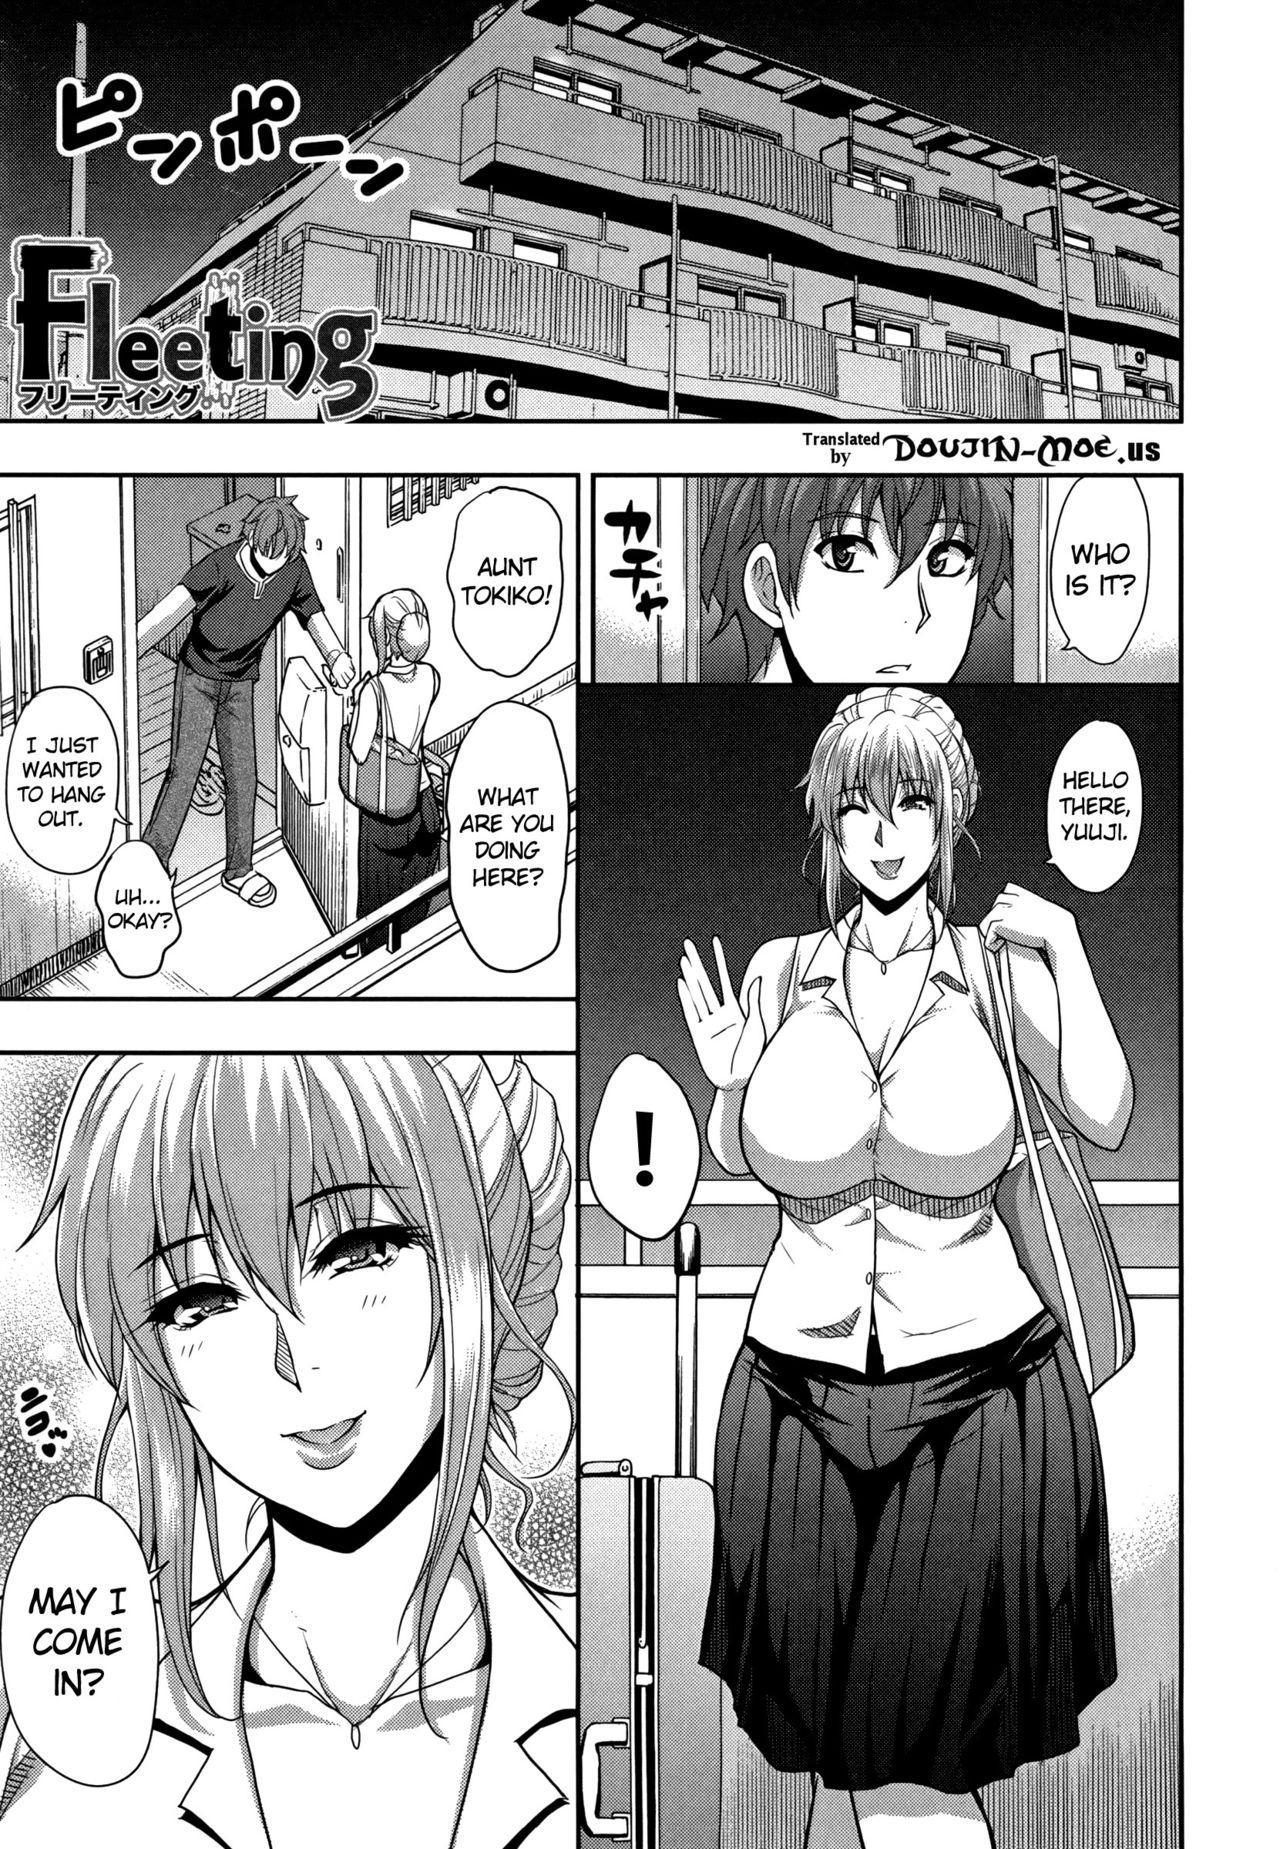 Fleeting 0